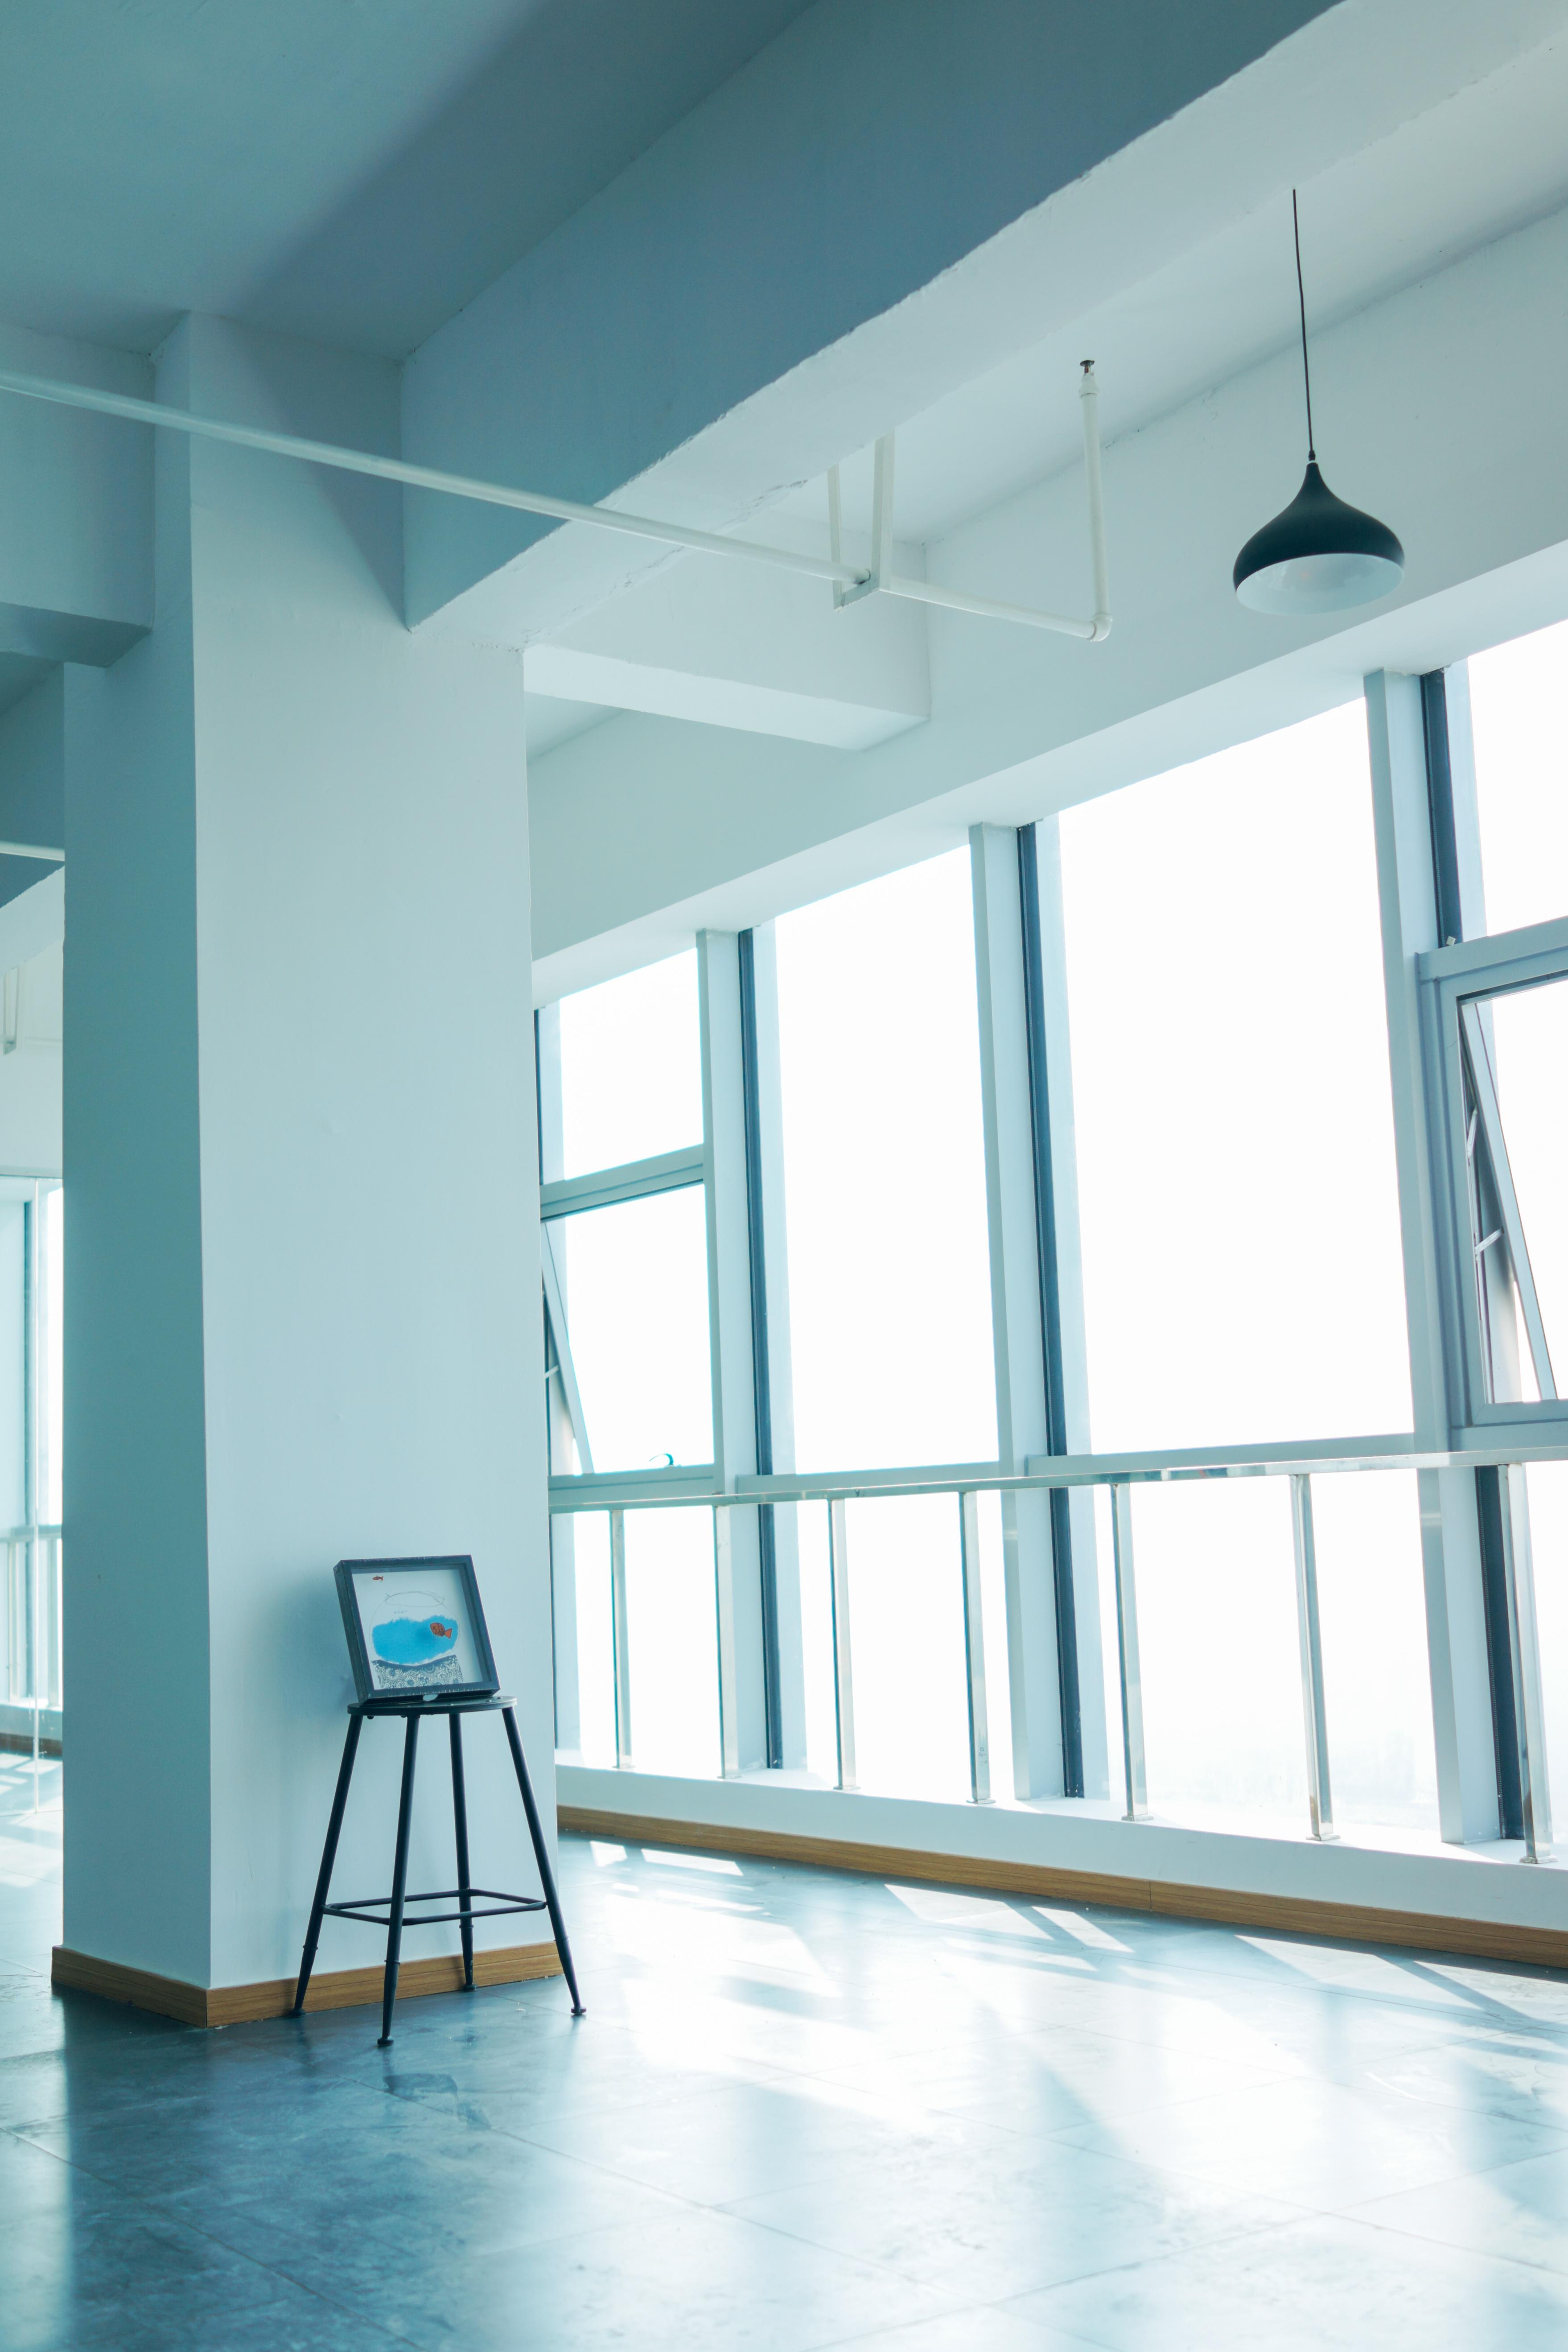 architectuur verdieping venster glas huis plafond zolder facade woonkamer professioneel kamer verlichting interieur ontwerp ontwerp